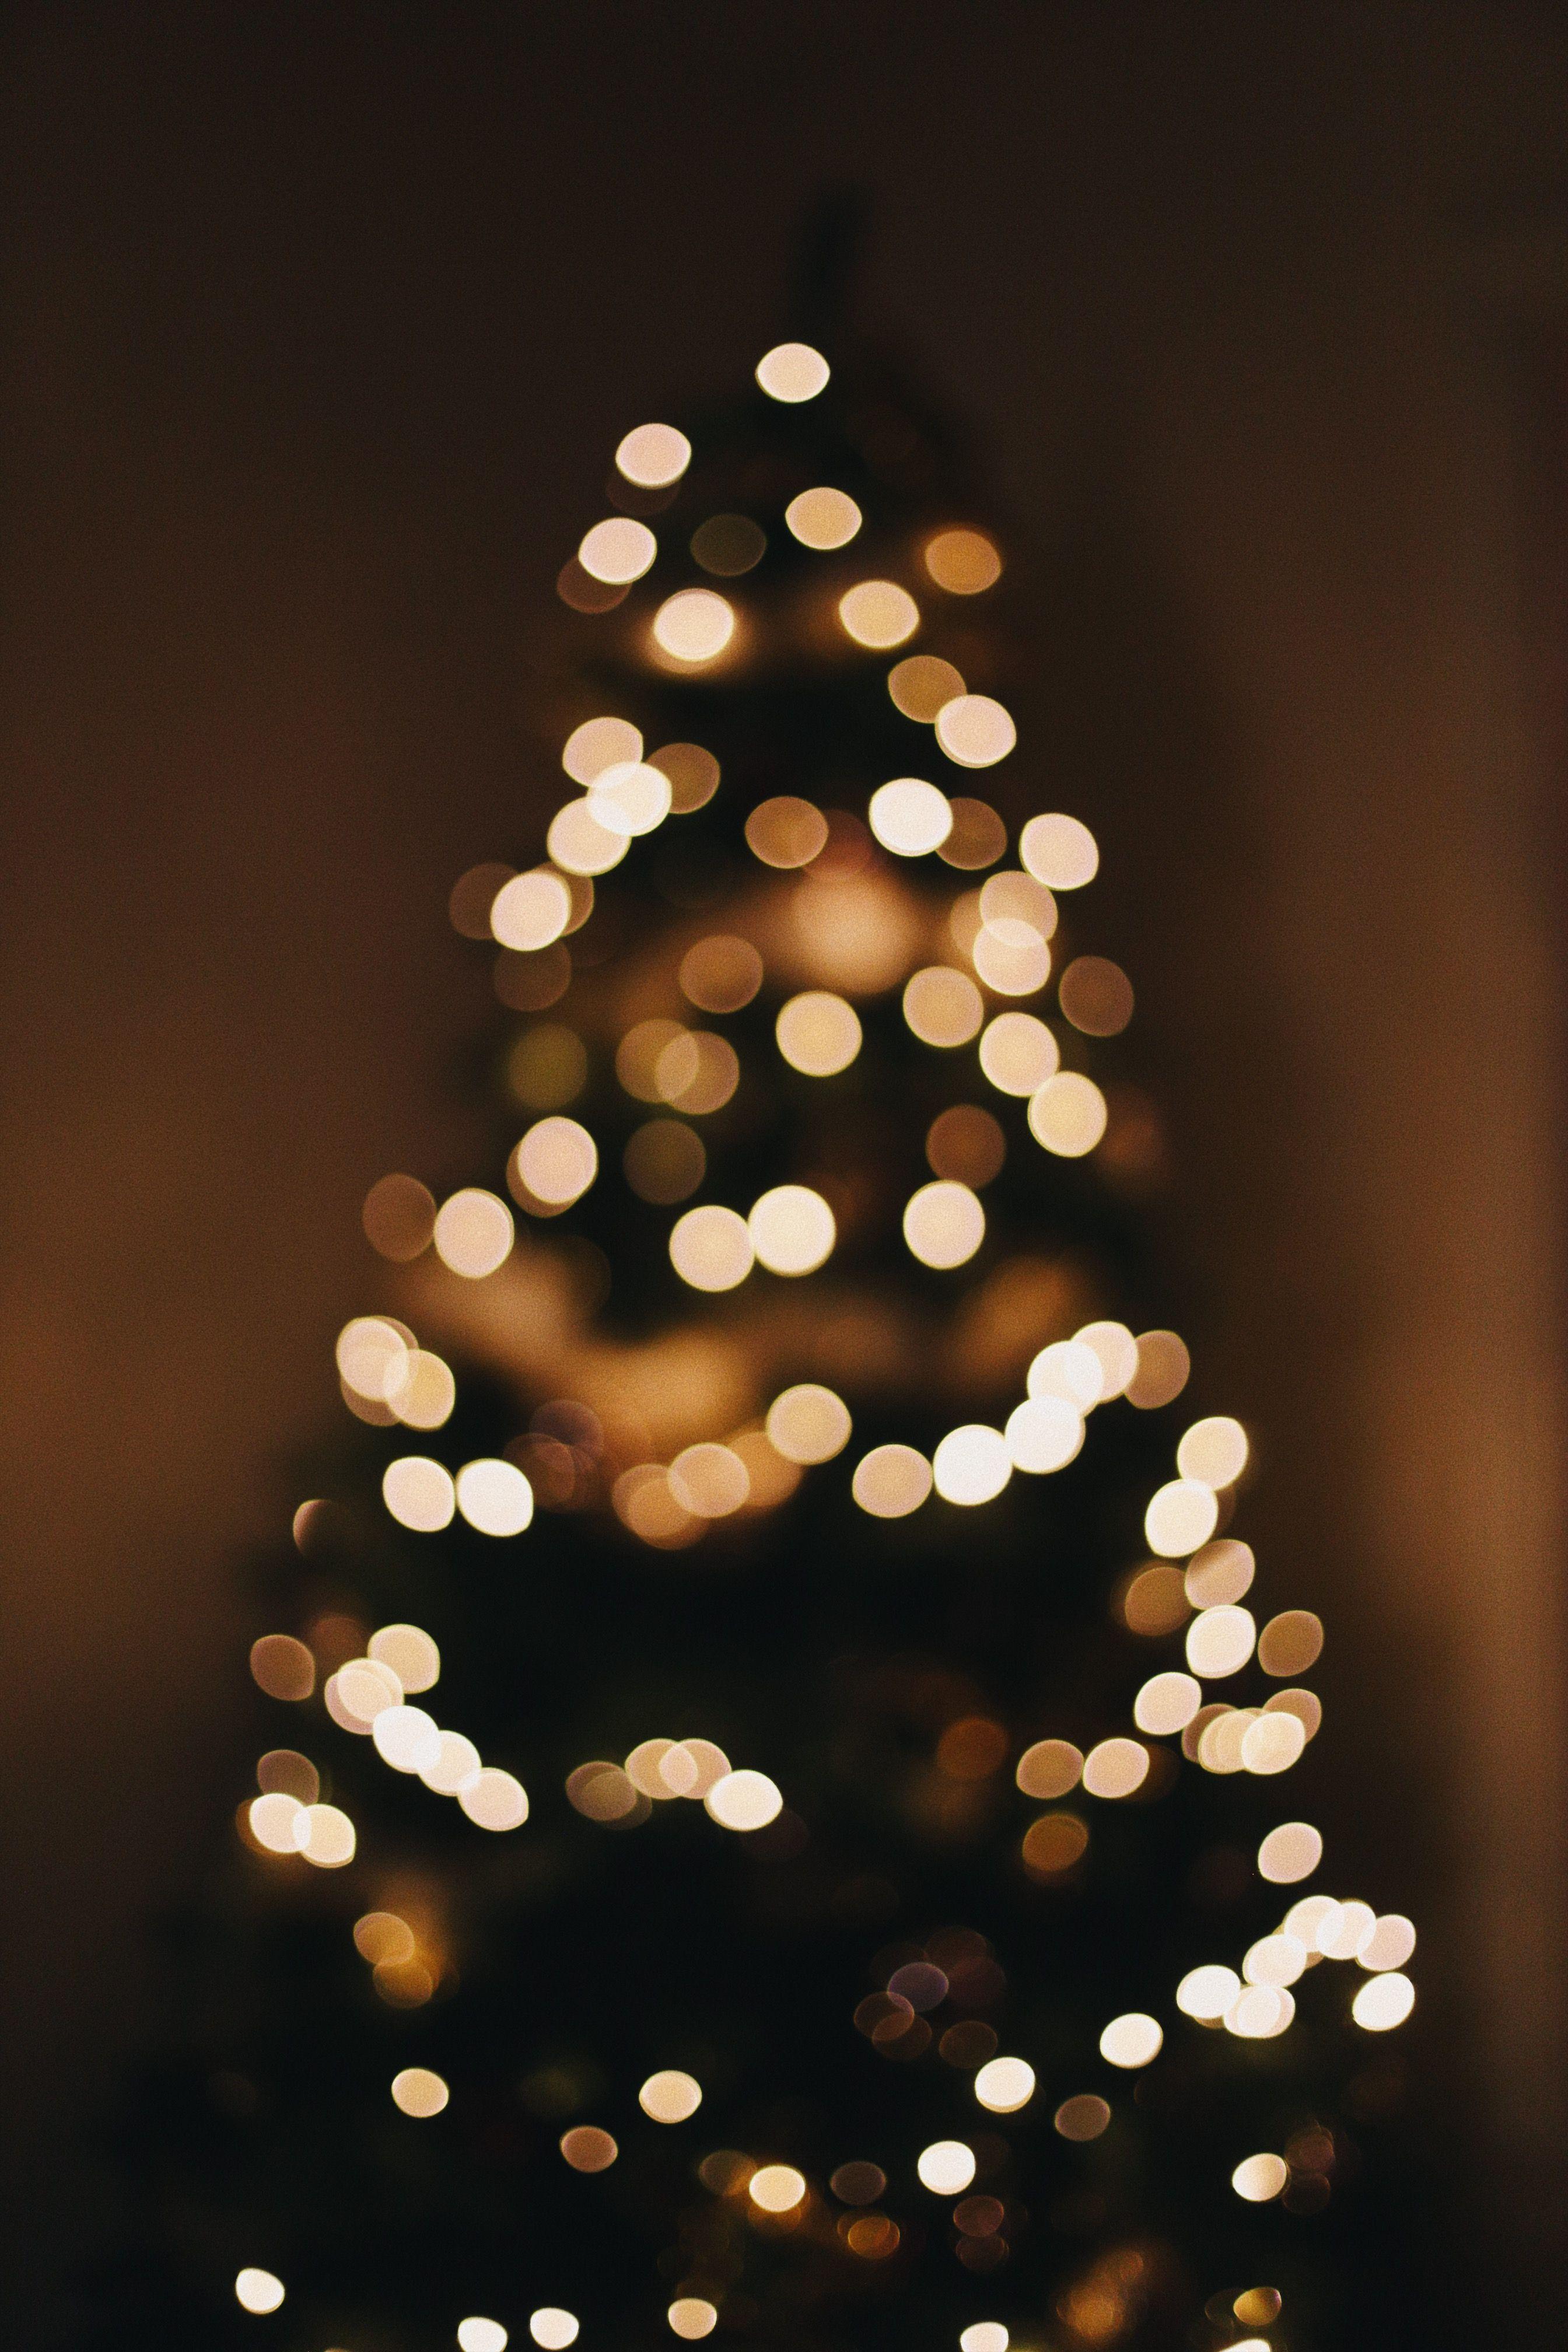 Espanpin Decorations Tree Newyearpost Christmasmood Christmasstuff Whitechristmas Diaryideas Xmasideas Pre Rozhdestvenskie Oboi Nastennye Kartiny Idei Kartiny